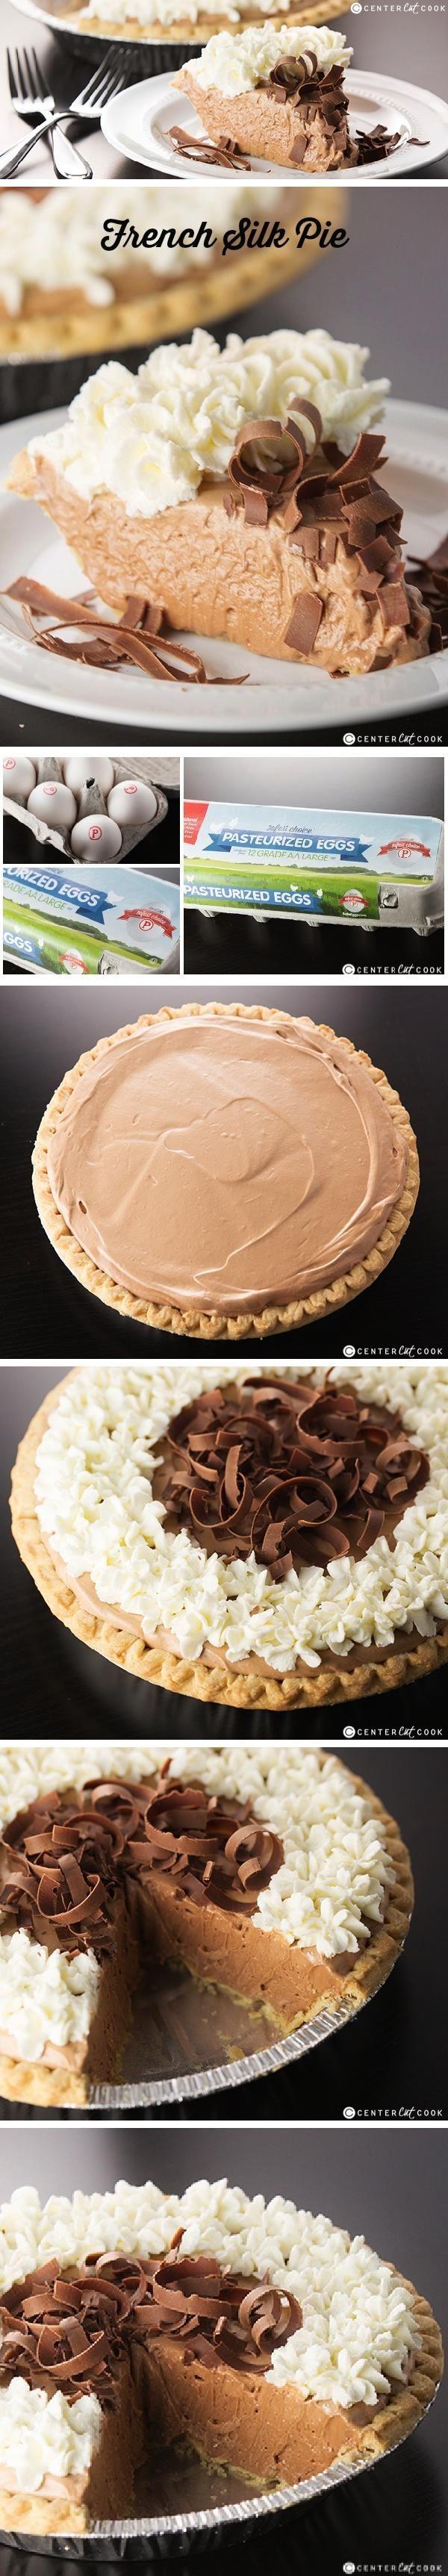 Best 25+ Chocolate silk pie ideas on Pinterest | Silk chocolate ...